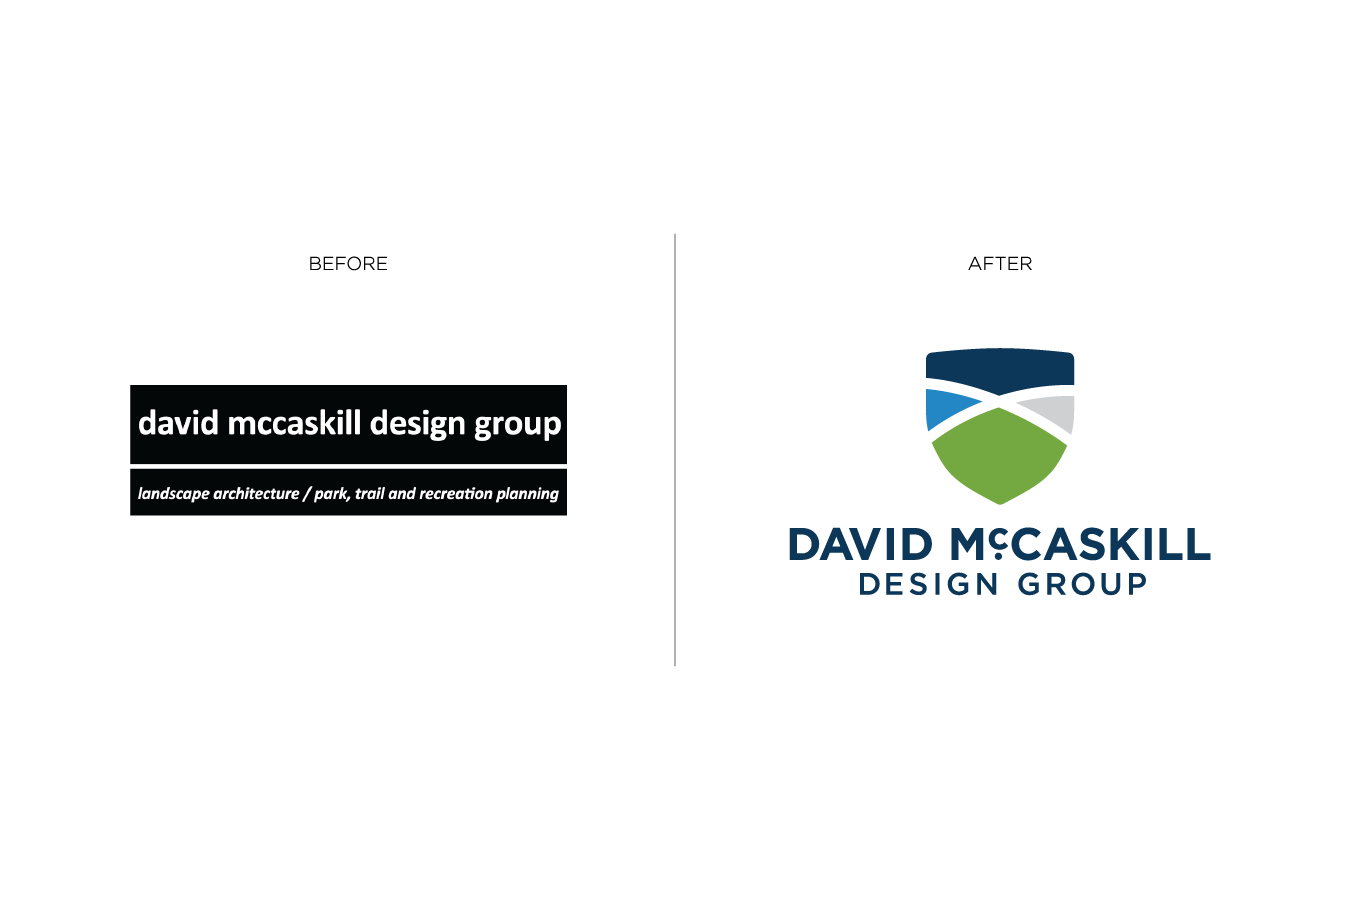 DMDG-logo-18.png